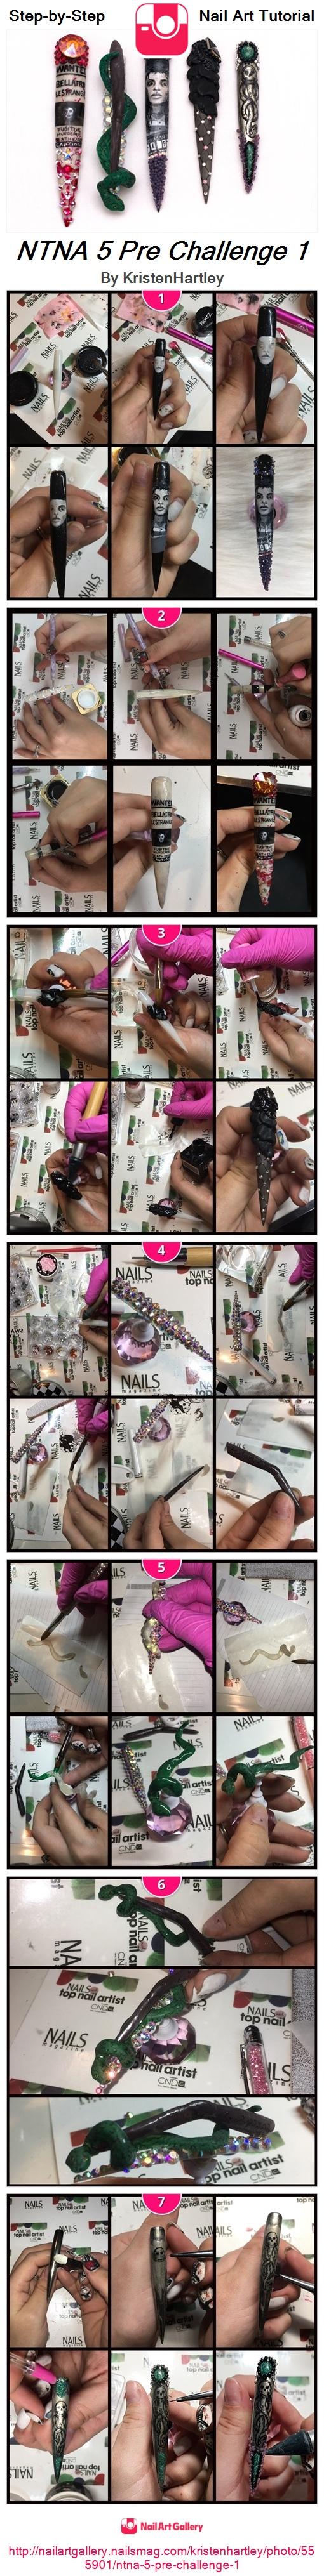 NTNA 5 Pre Challenge 1 - Nail Art Gallery